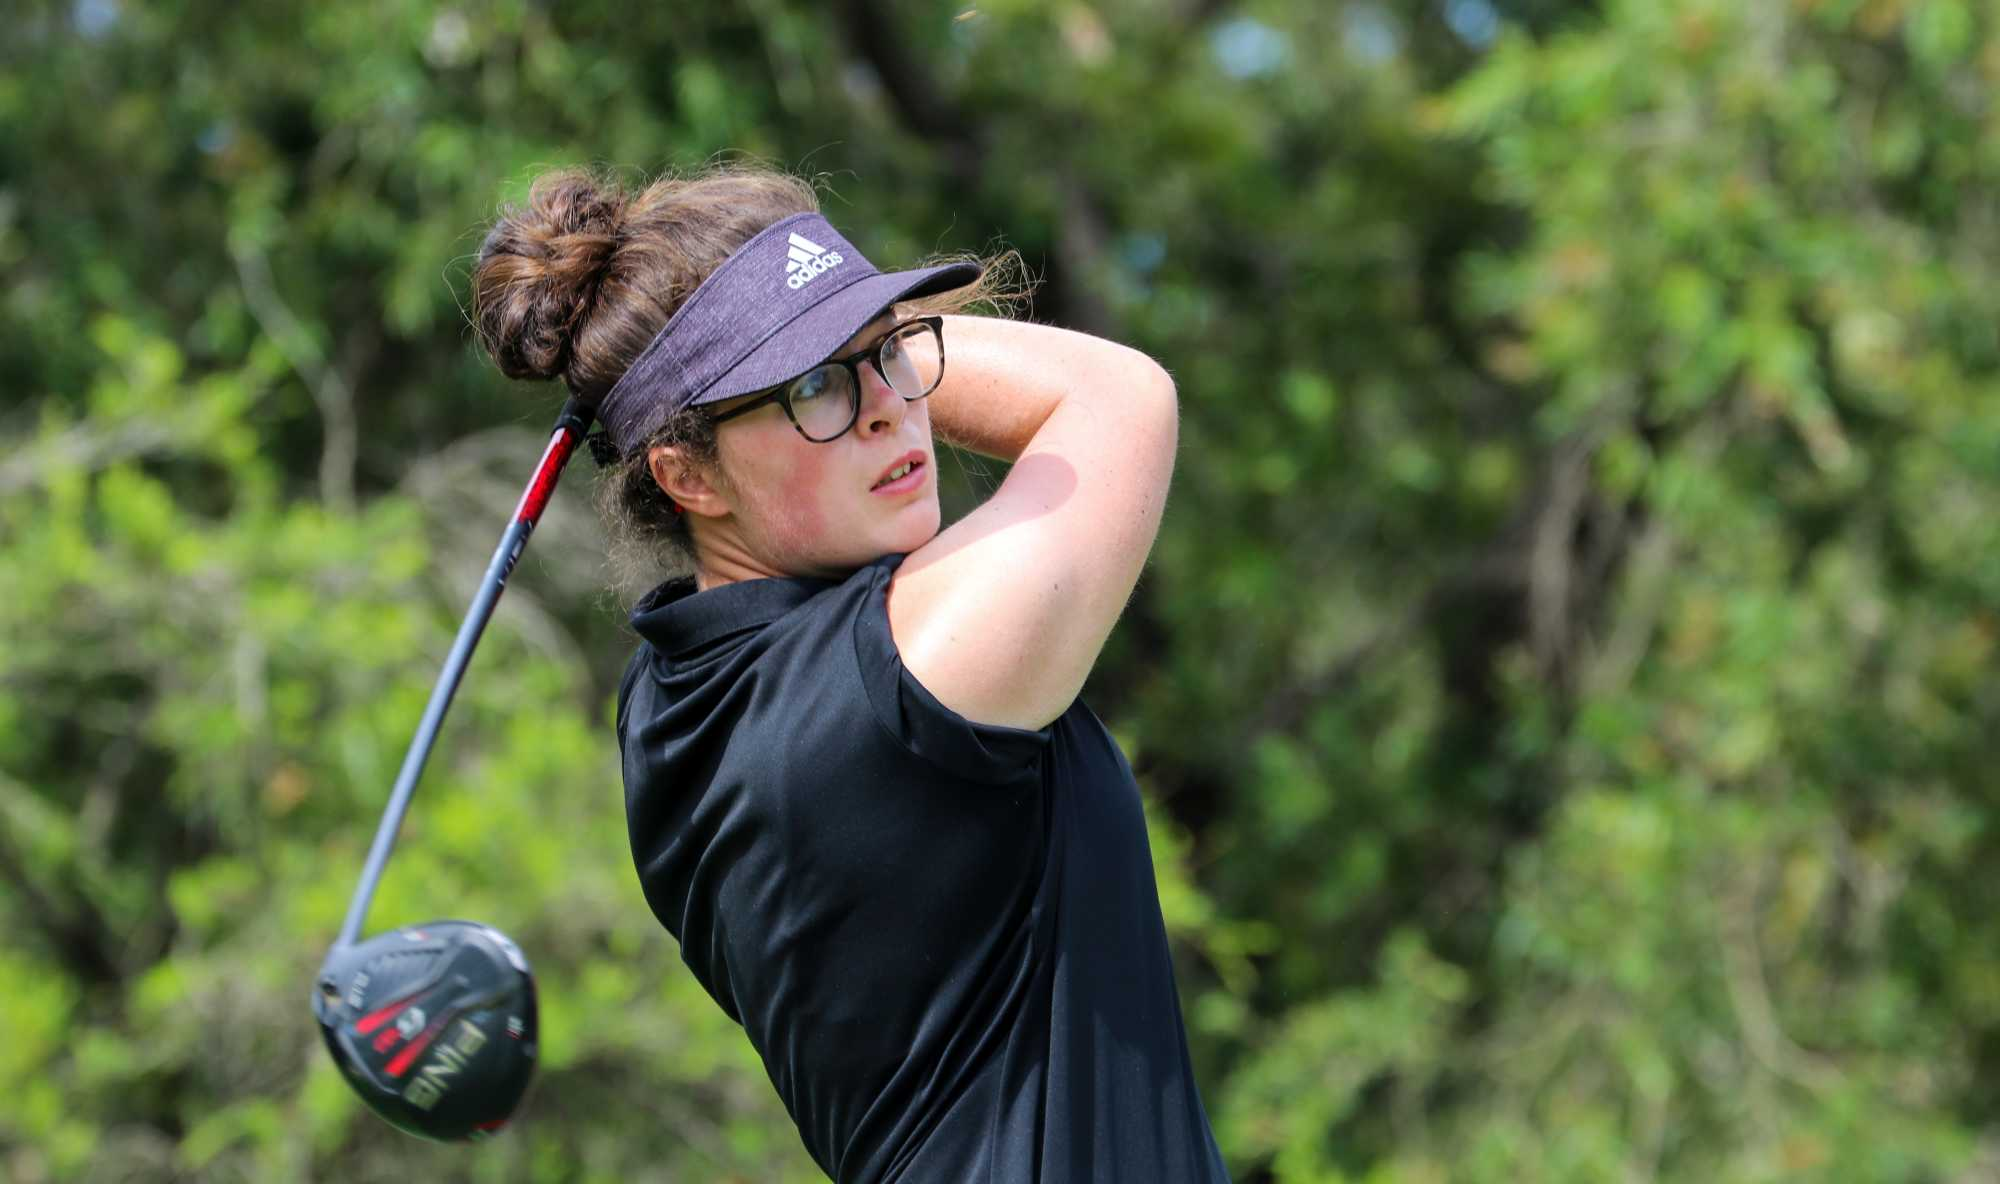 Amateur Photos england's toy seizes women's #ausam lead - golf australia